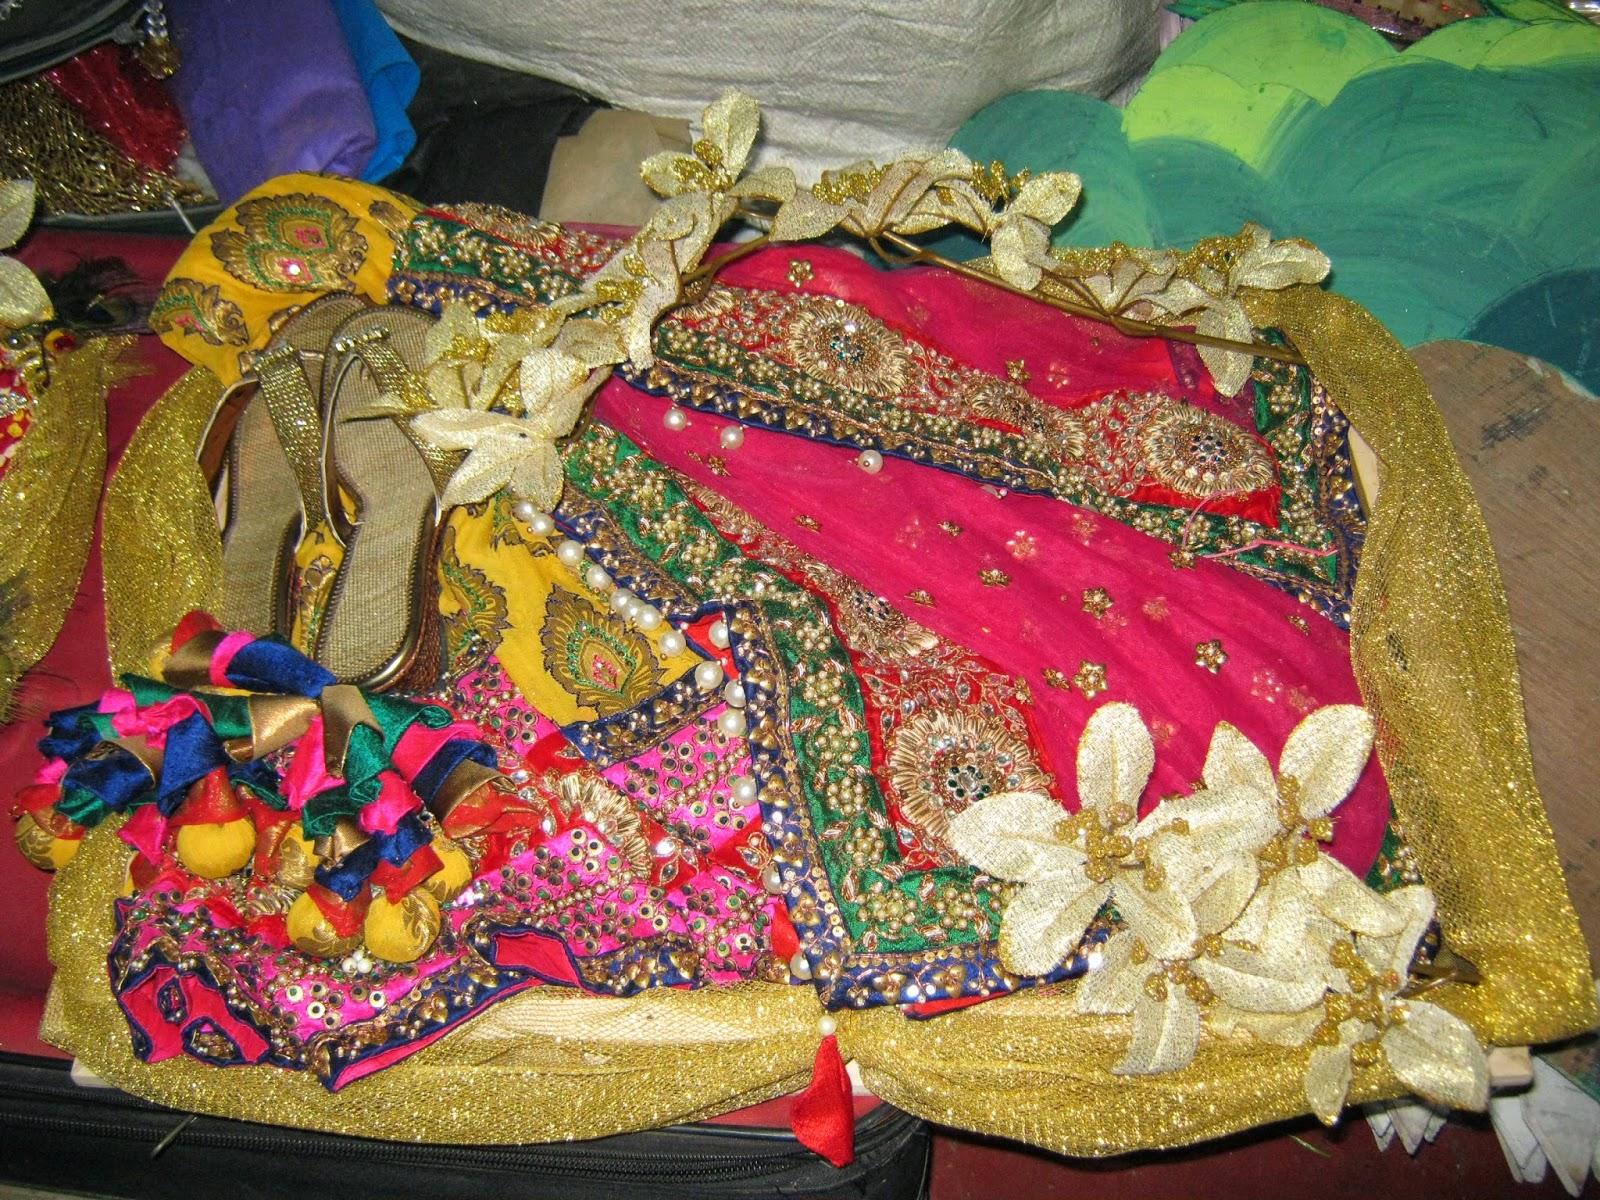 Cake Making Classes In Kolkata : Packing and Craft Classes by Manju Karnani